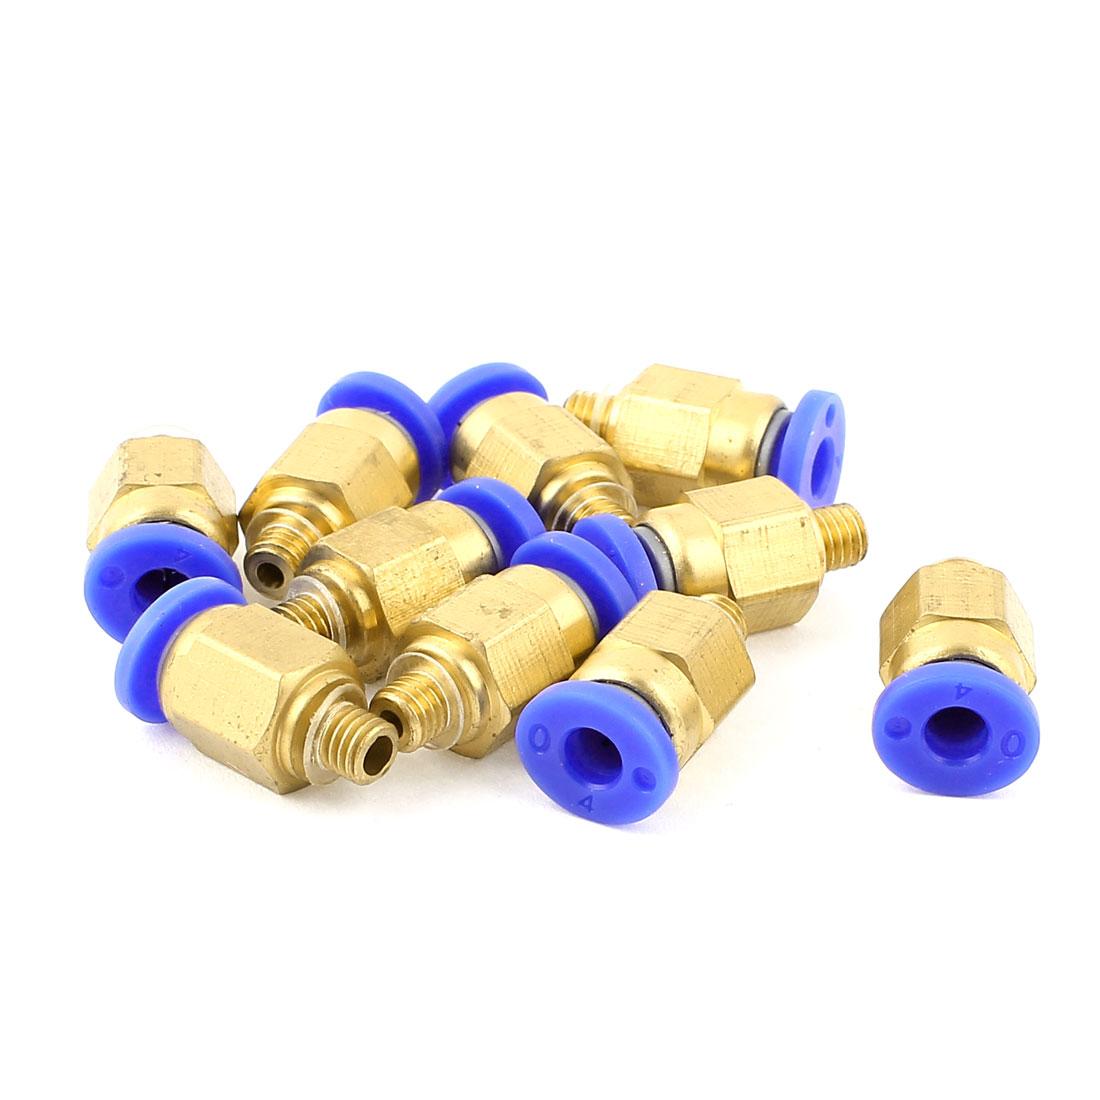 M5 5mm Thread 4mm Tube Dia Air Pneumatic Quick Fitting Coupler Connectors 10pcs